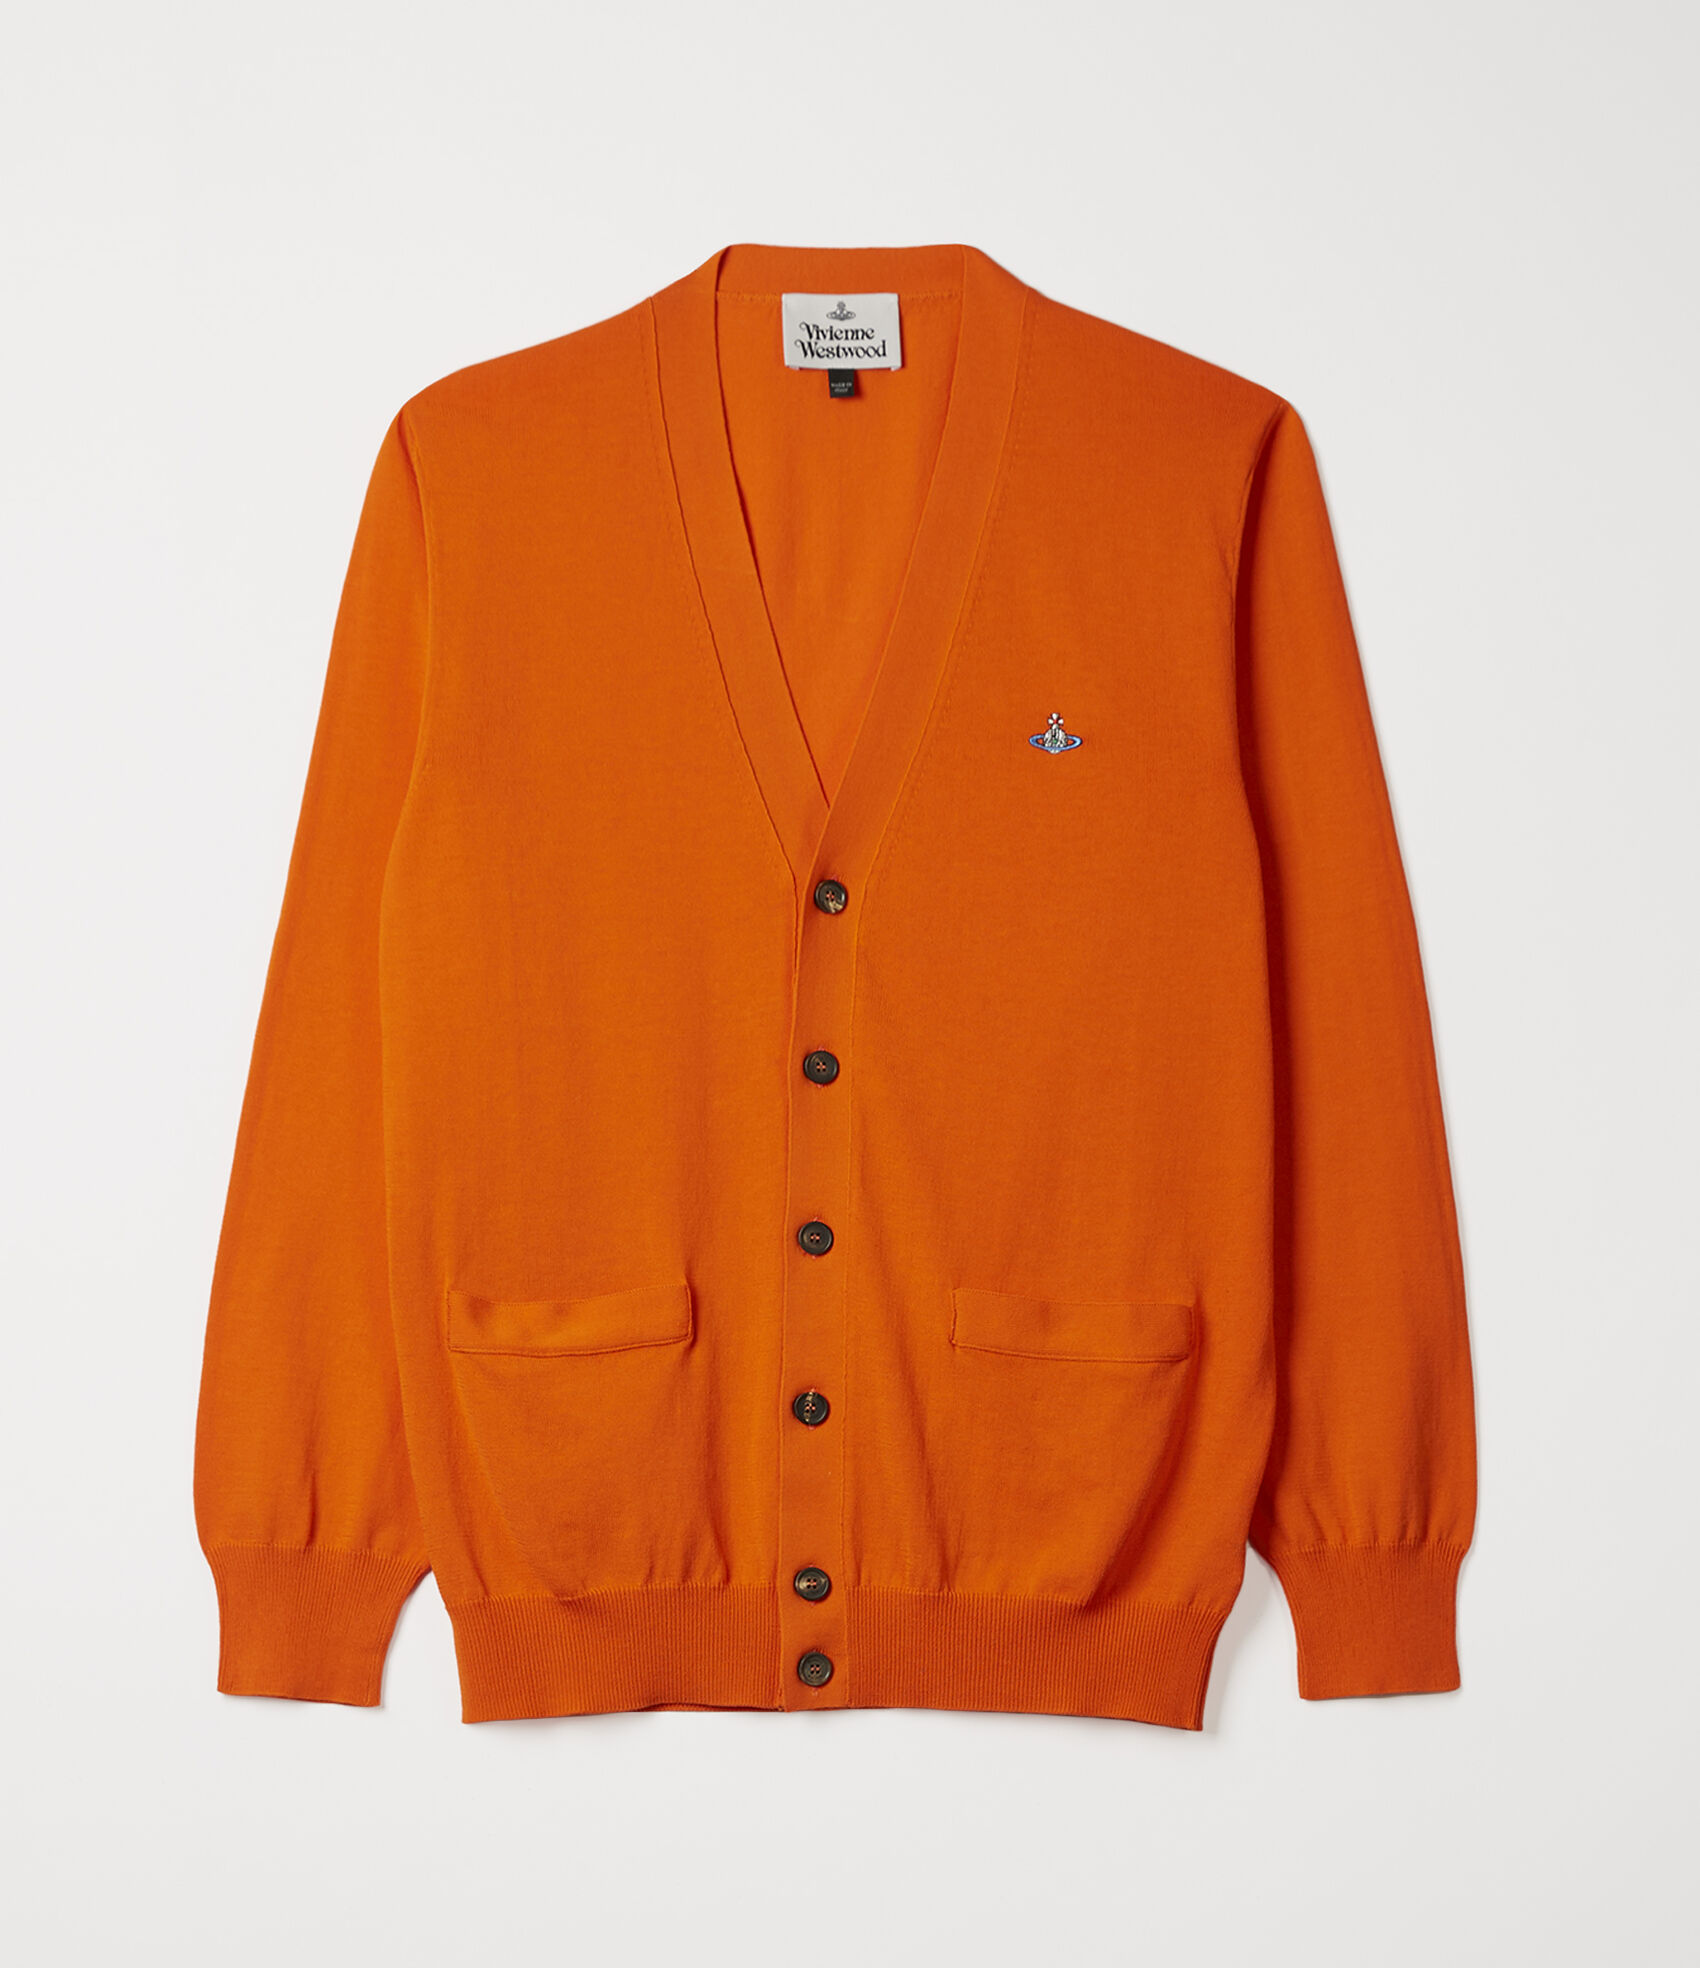 c08bf8a8c0db29 Vivienne Westwood Men's Designer Knitwear | Vivienne Westwood - Classic  Cardigan Orange